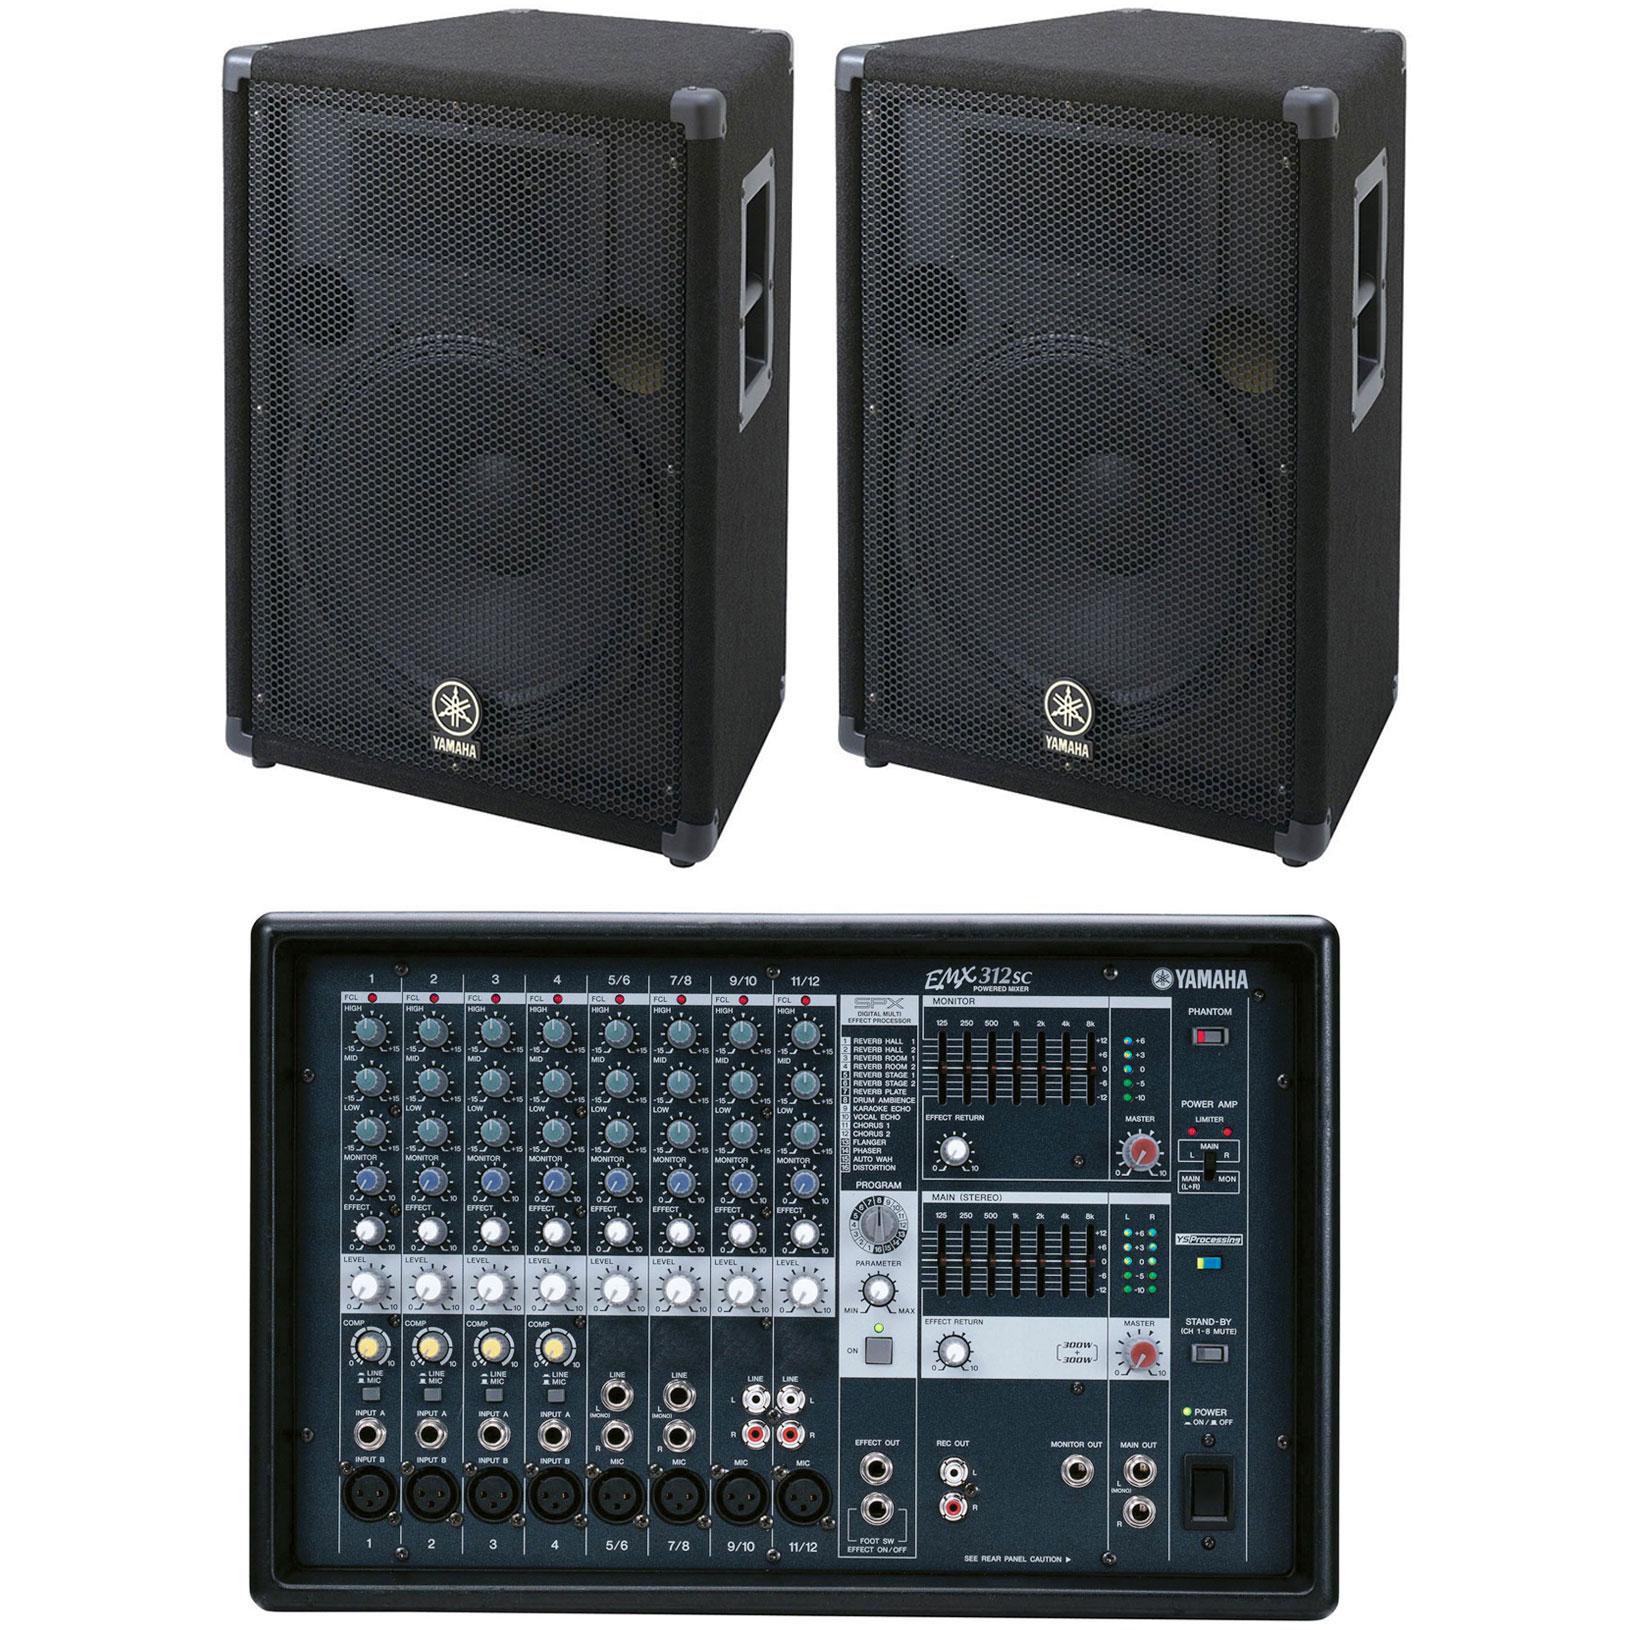 Soundanlage